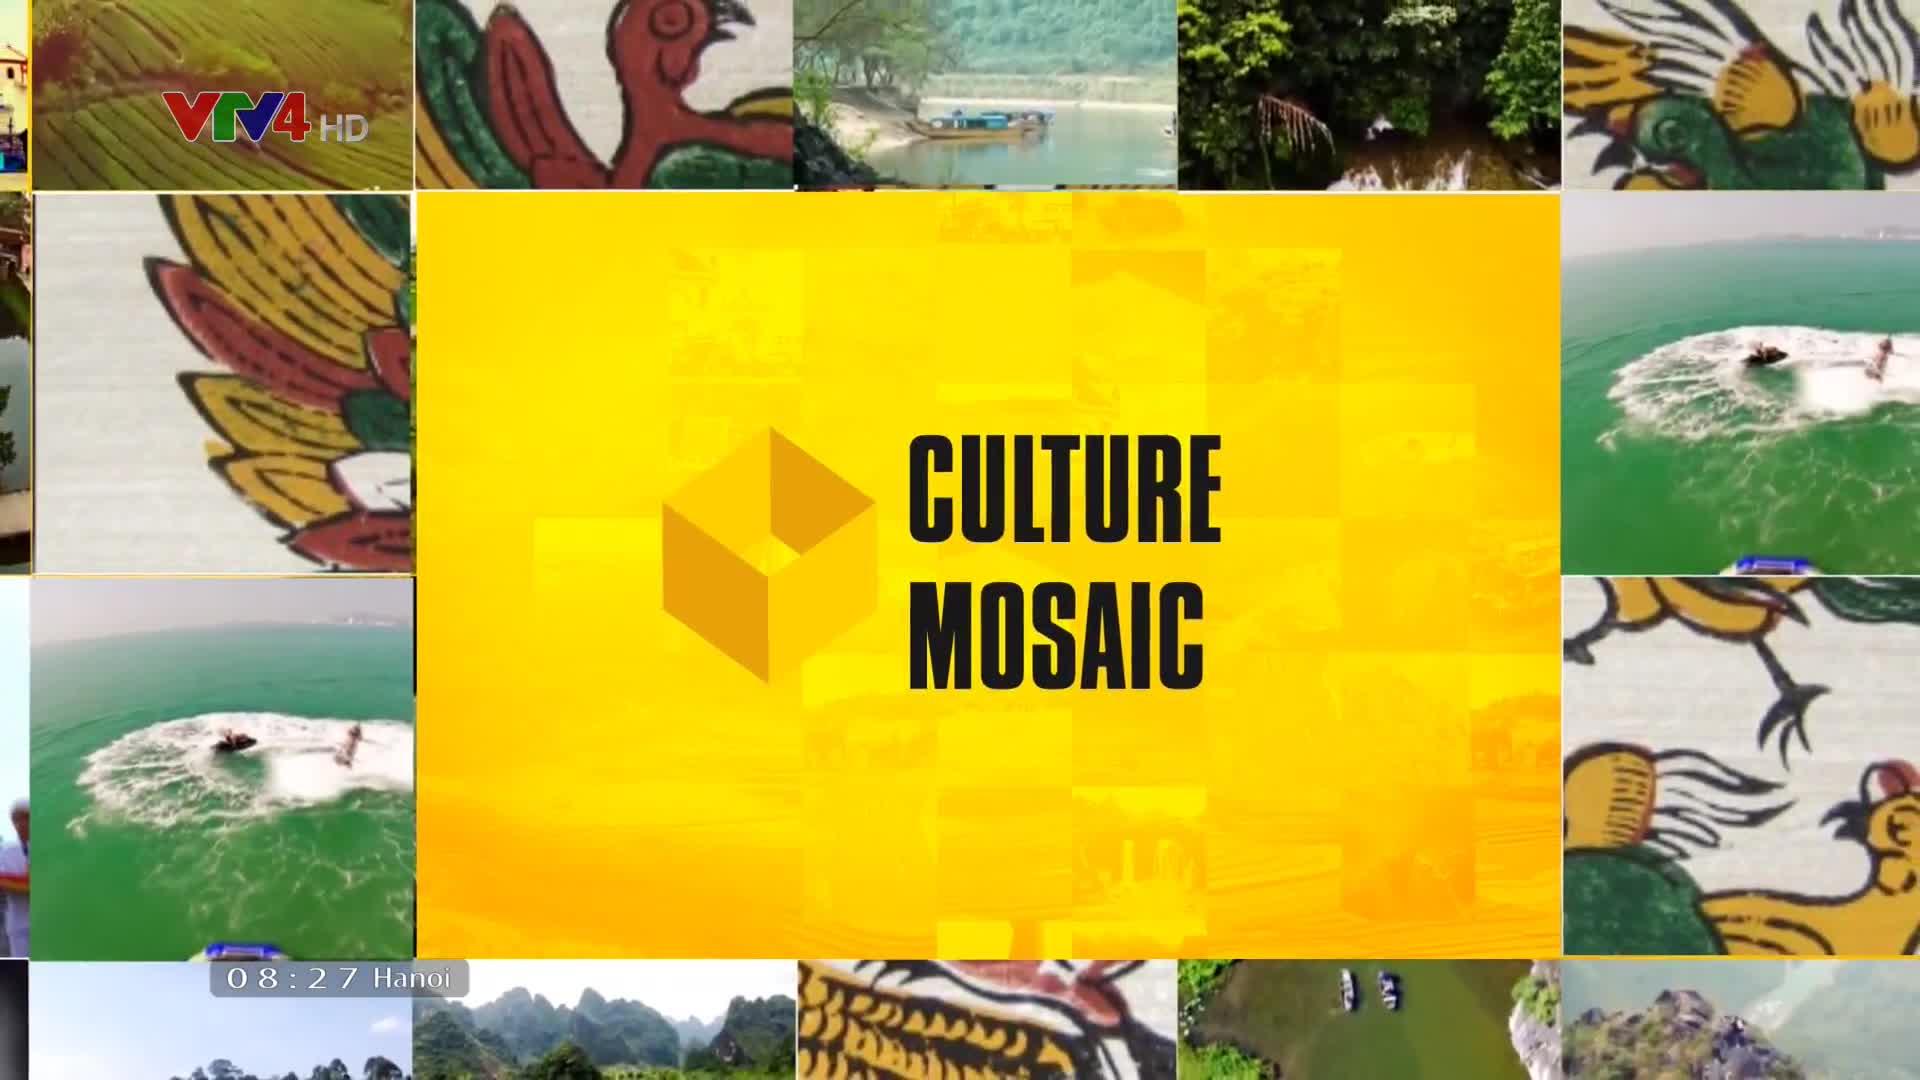 Culture Mosaic - 8/31/2019